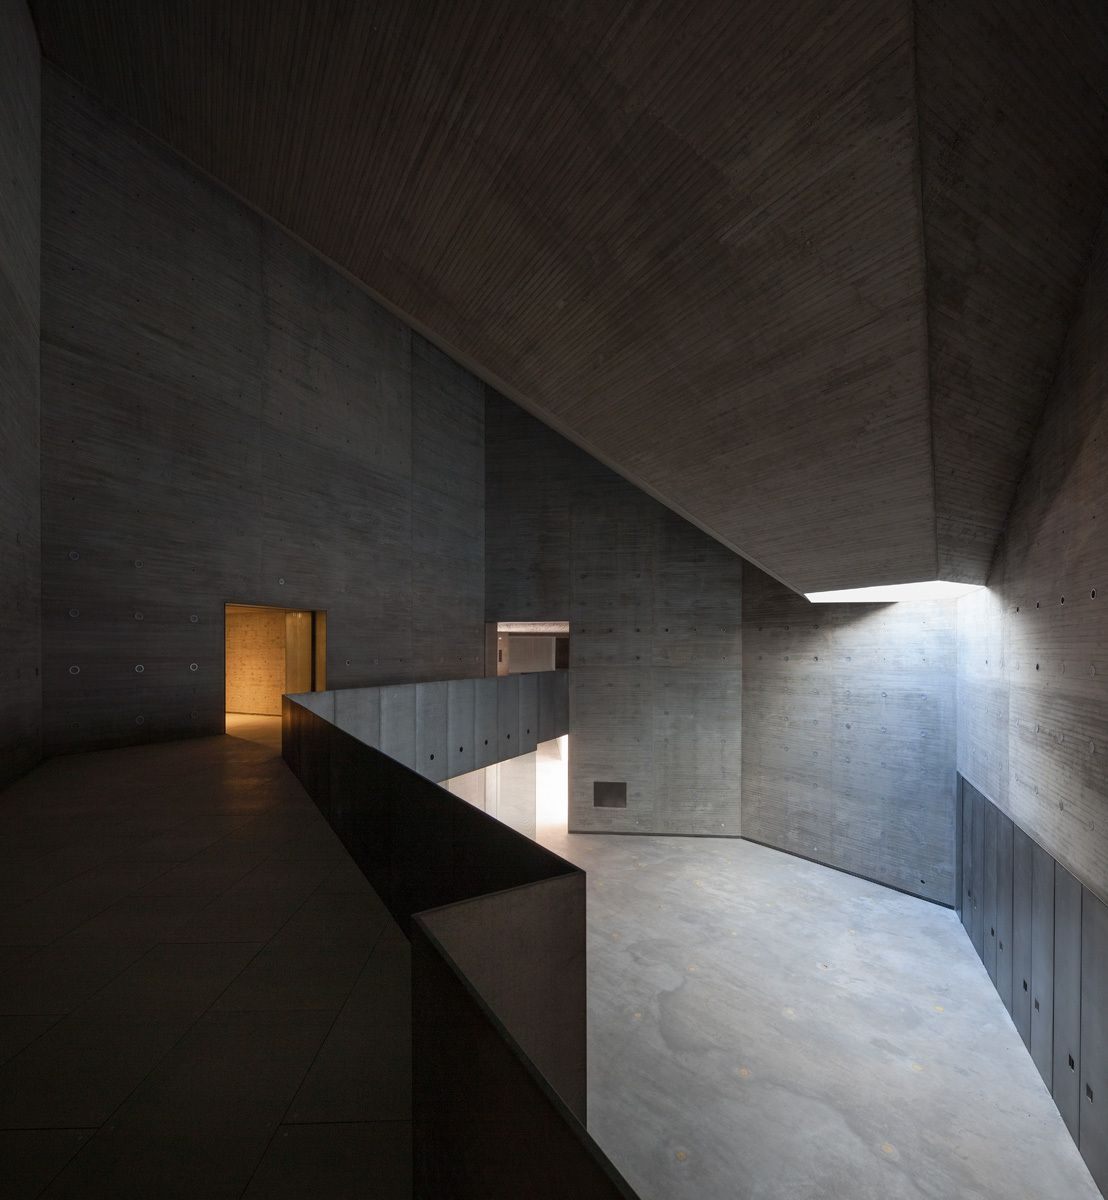 Gallery Of Casa Sacerdotal Diocesana De Plasencia Andres Jaque  # Muebles Sequeira Plasencia